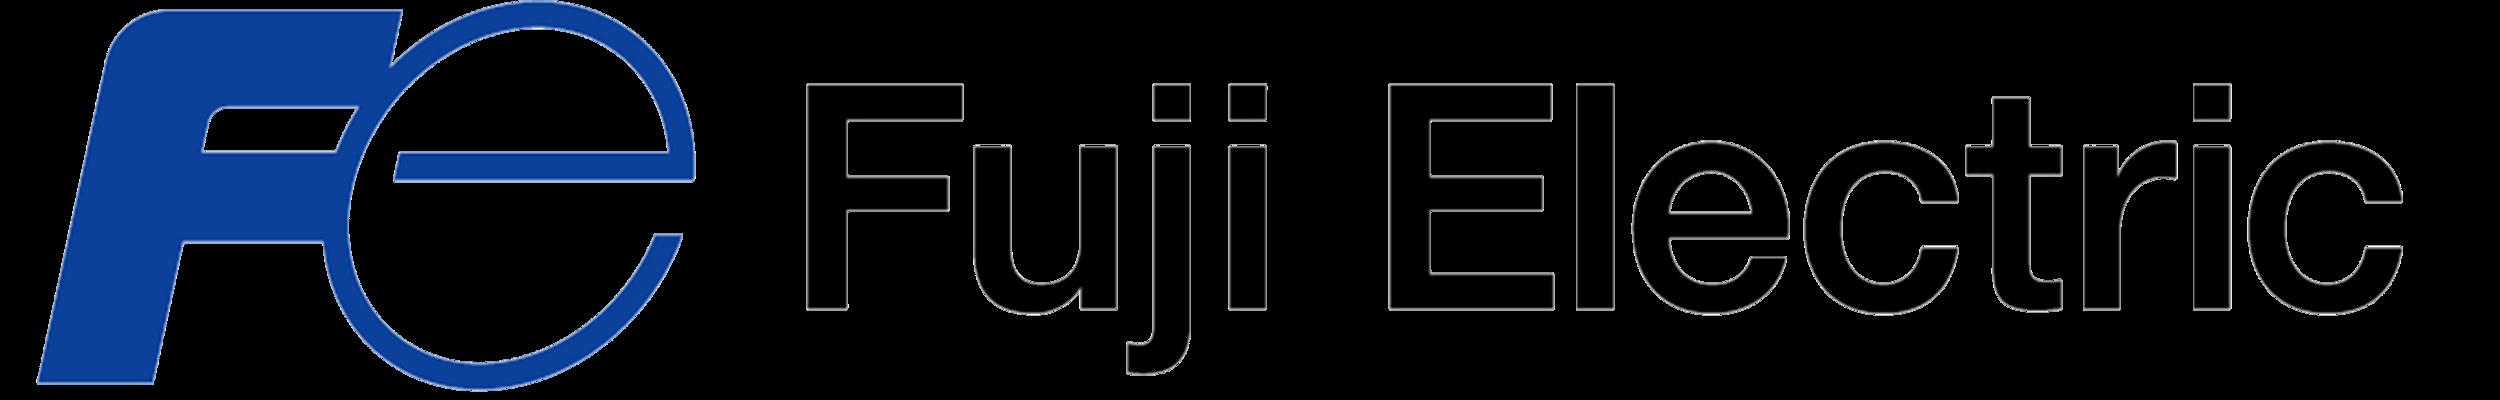 Copy of Fuji Electric